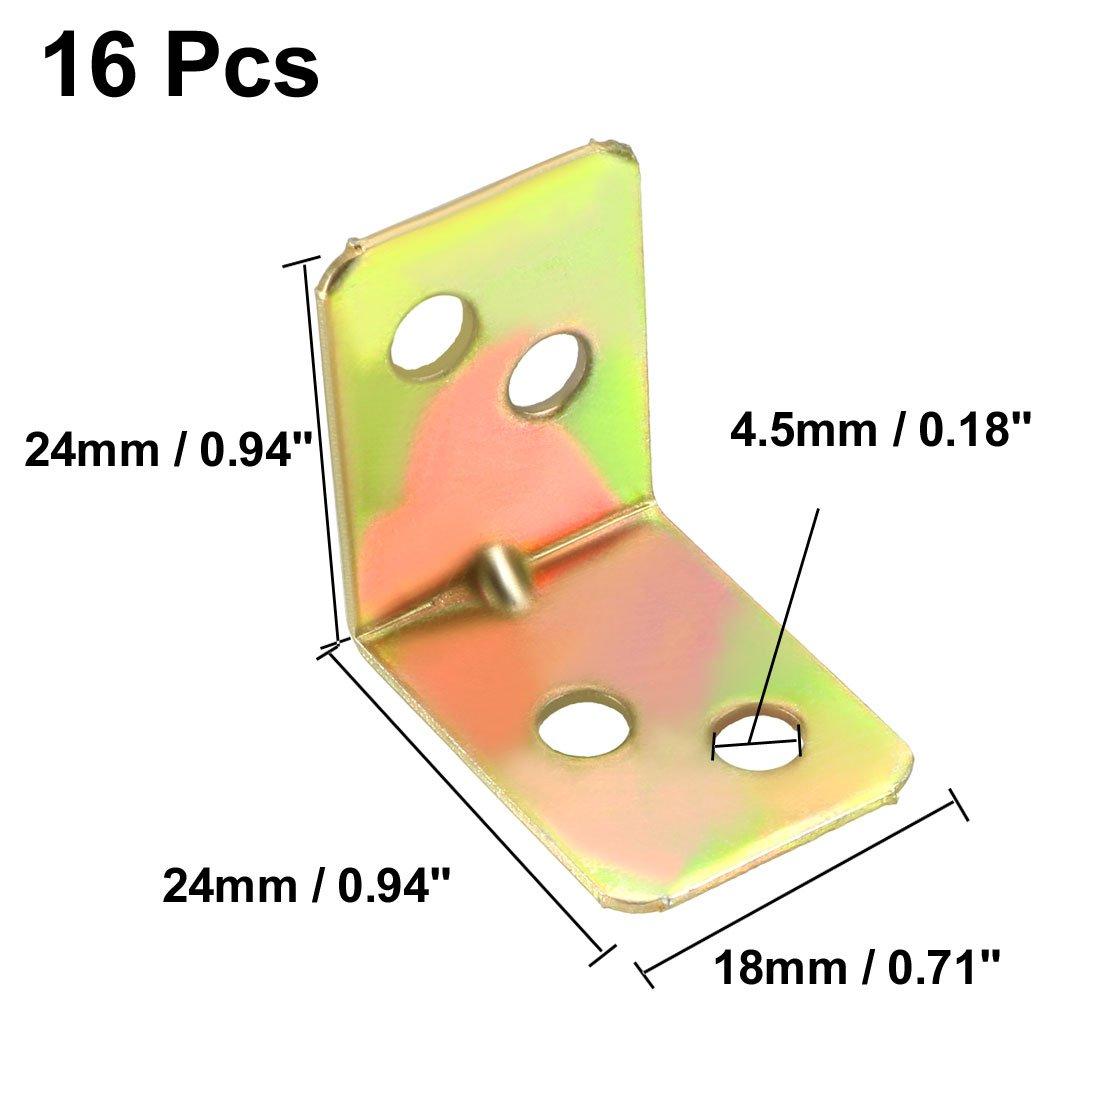 sourcing map Equerre renfort angle fer Att AChe forme L 20mmx20mmx29mm ronde fin 10pcs